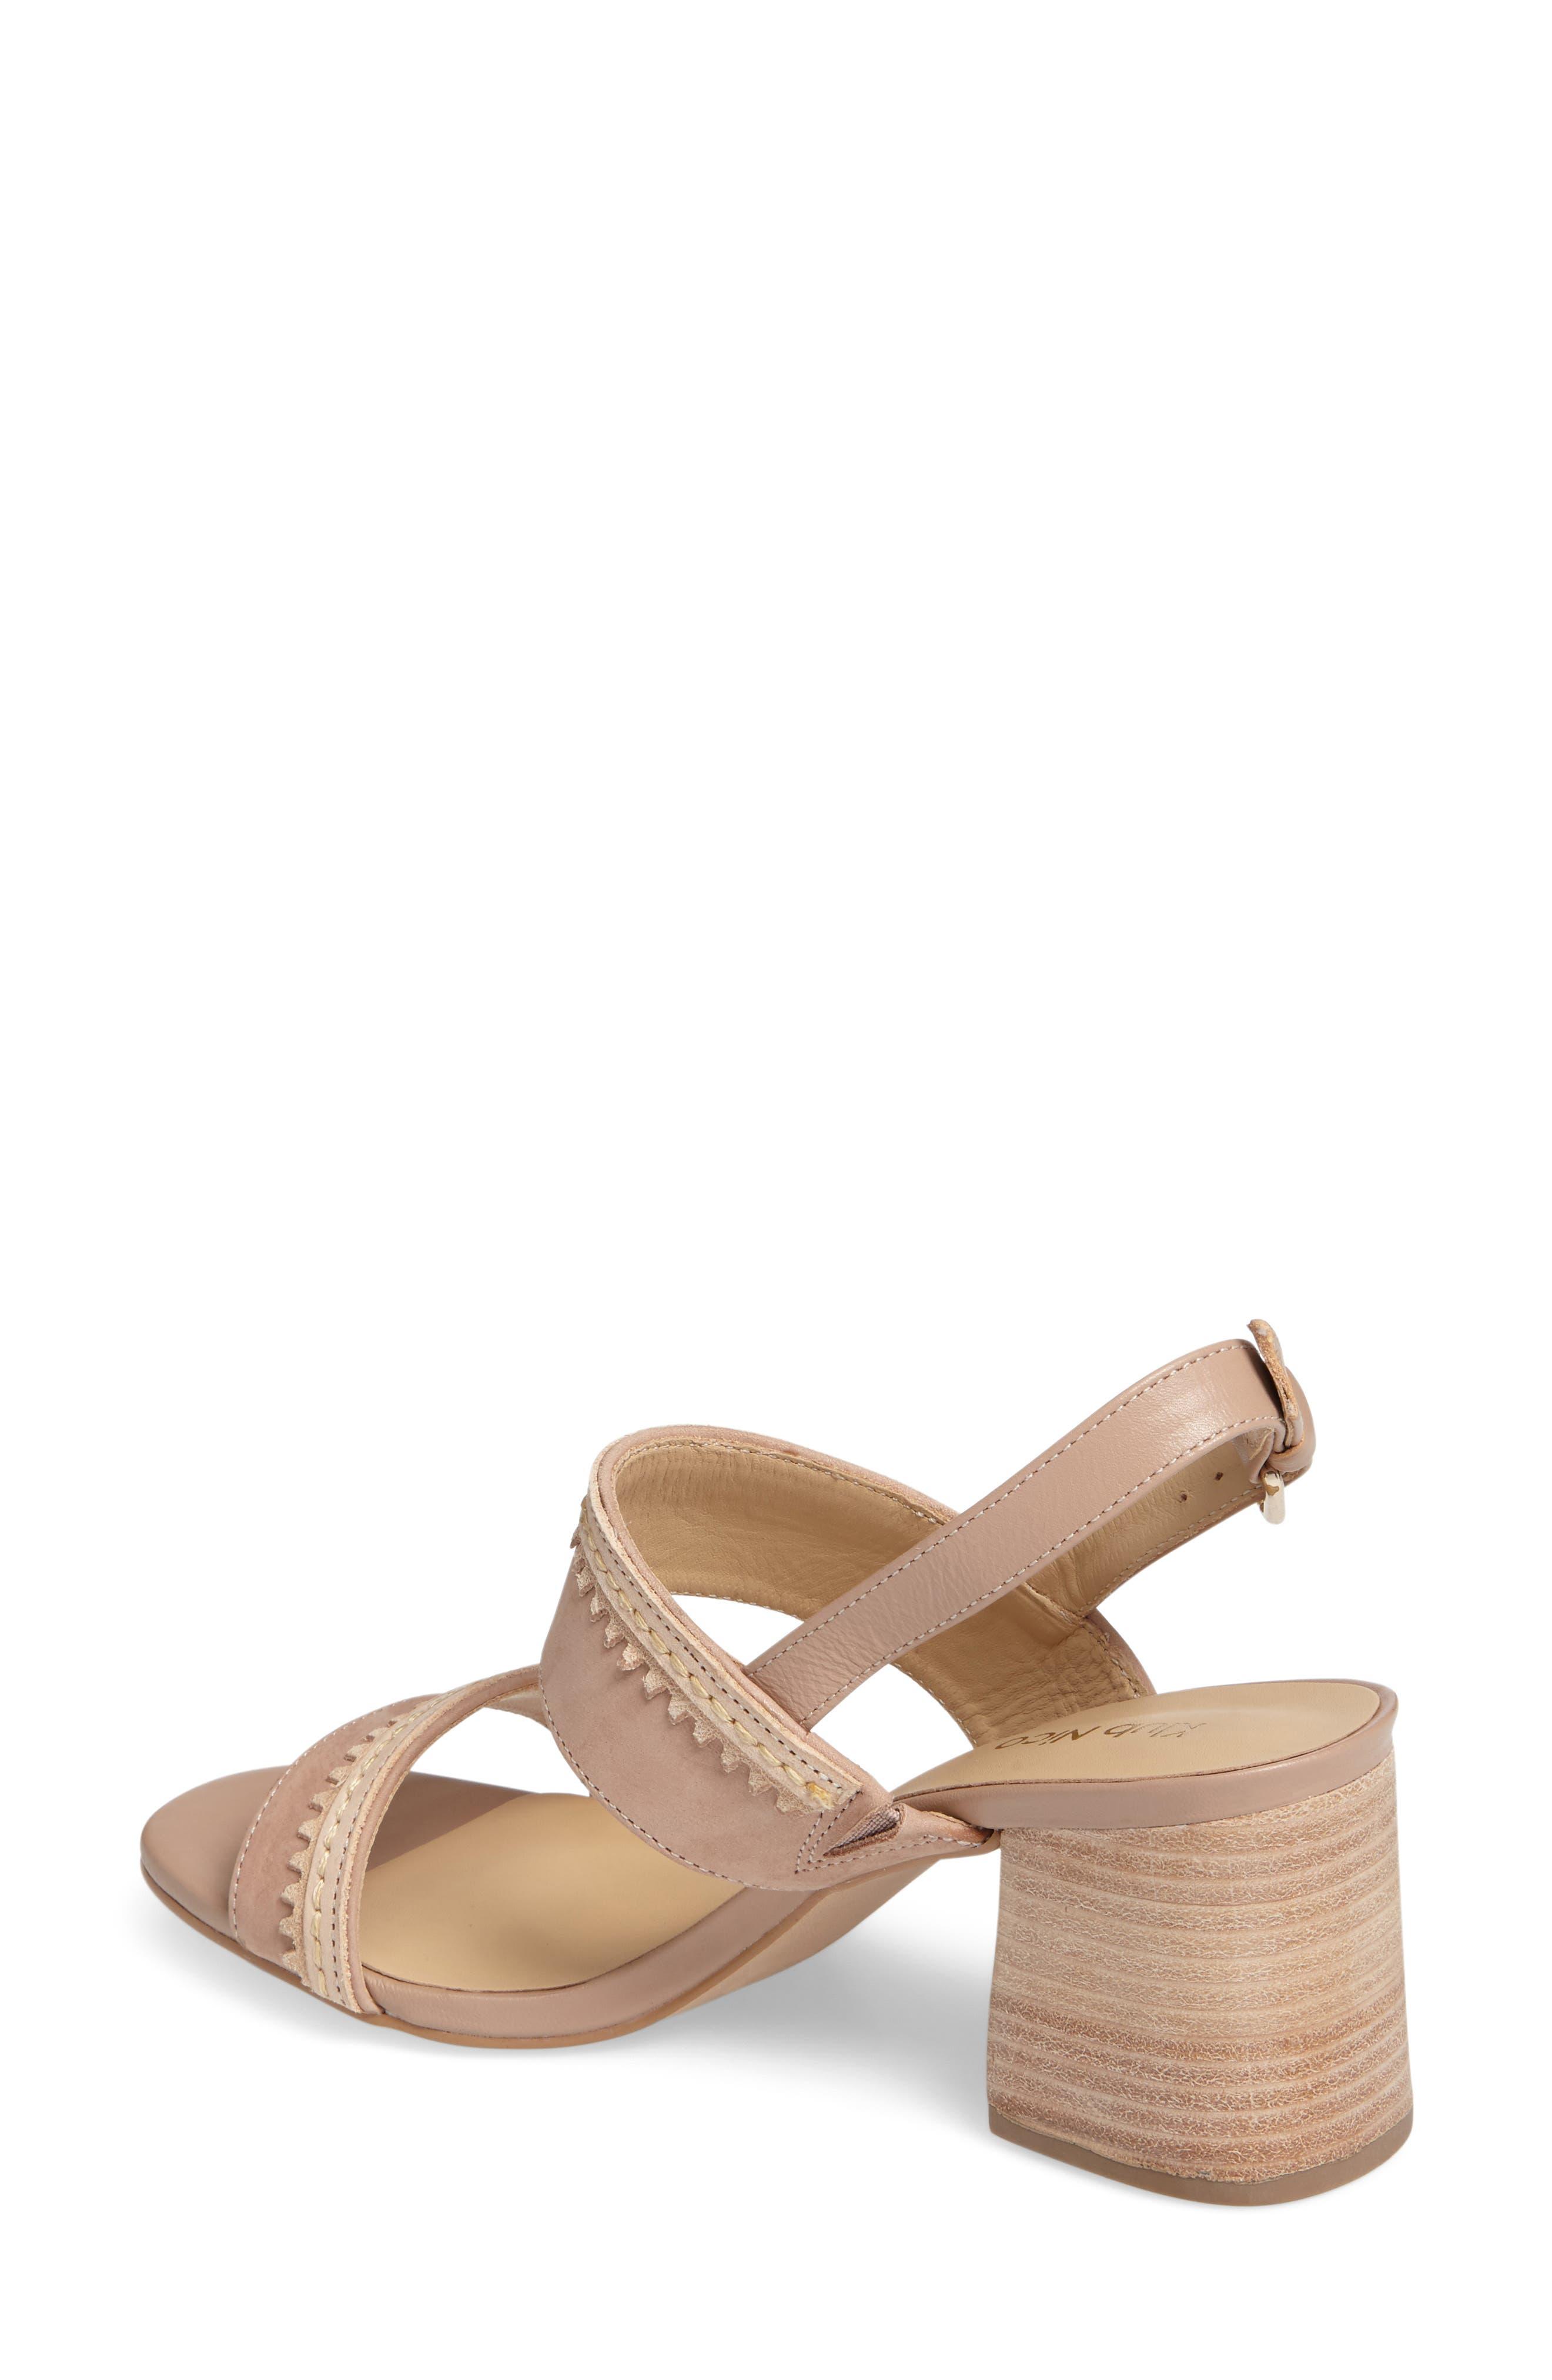 Rycca Block Heel Sandal,                             Alternate thumbnail 2, color,                             Blush Leather